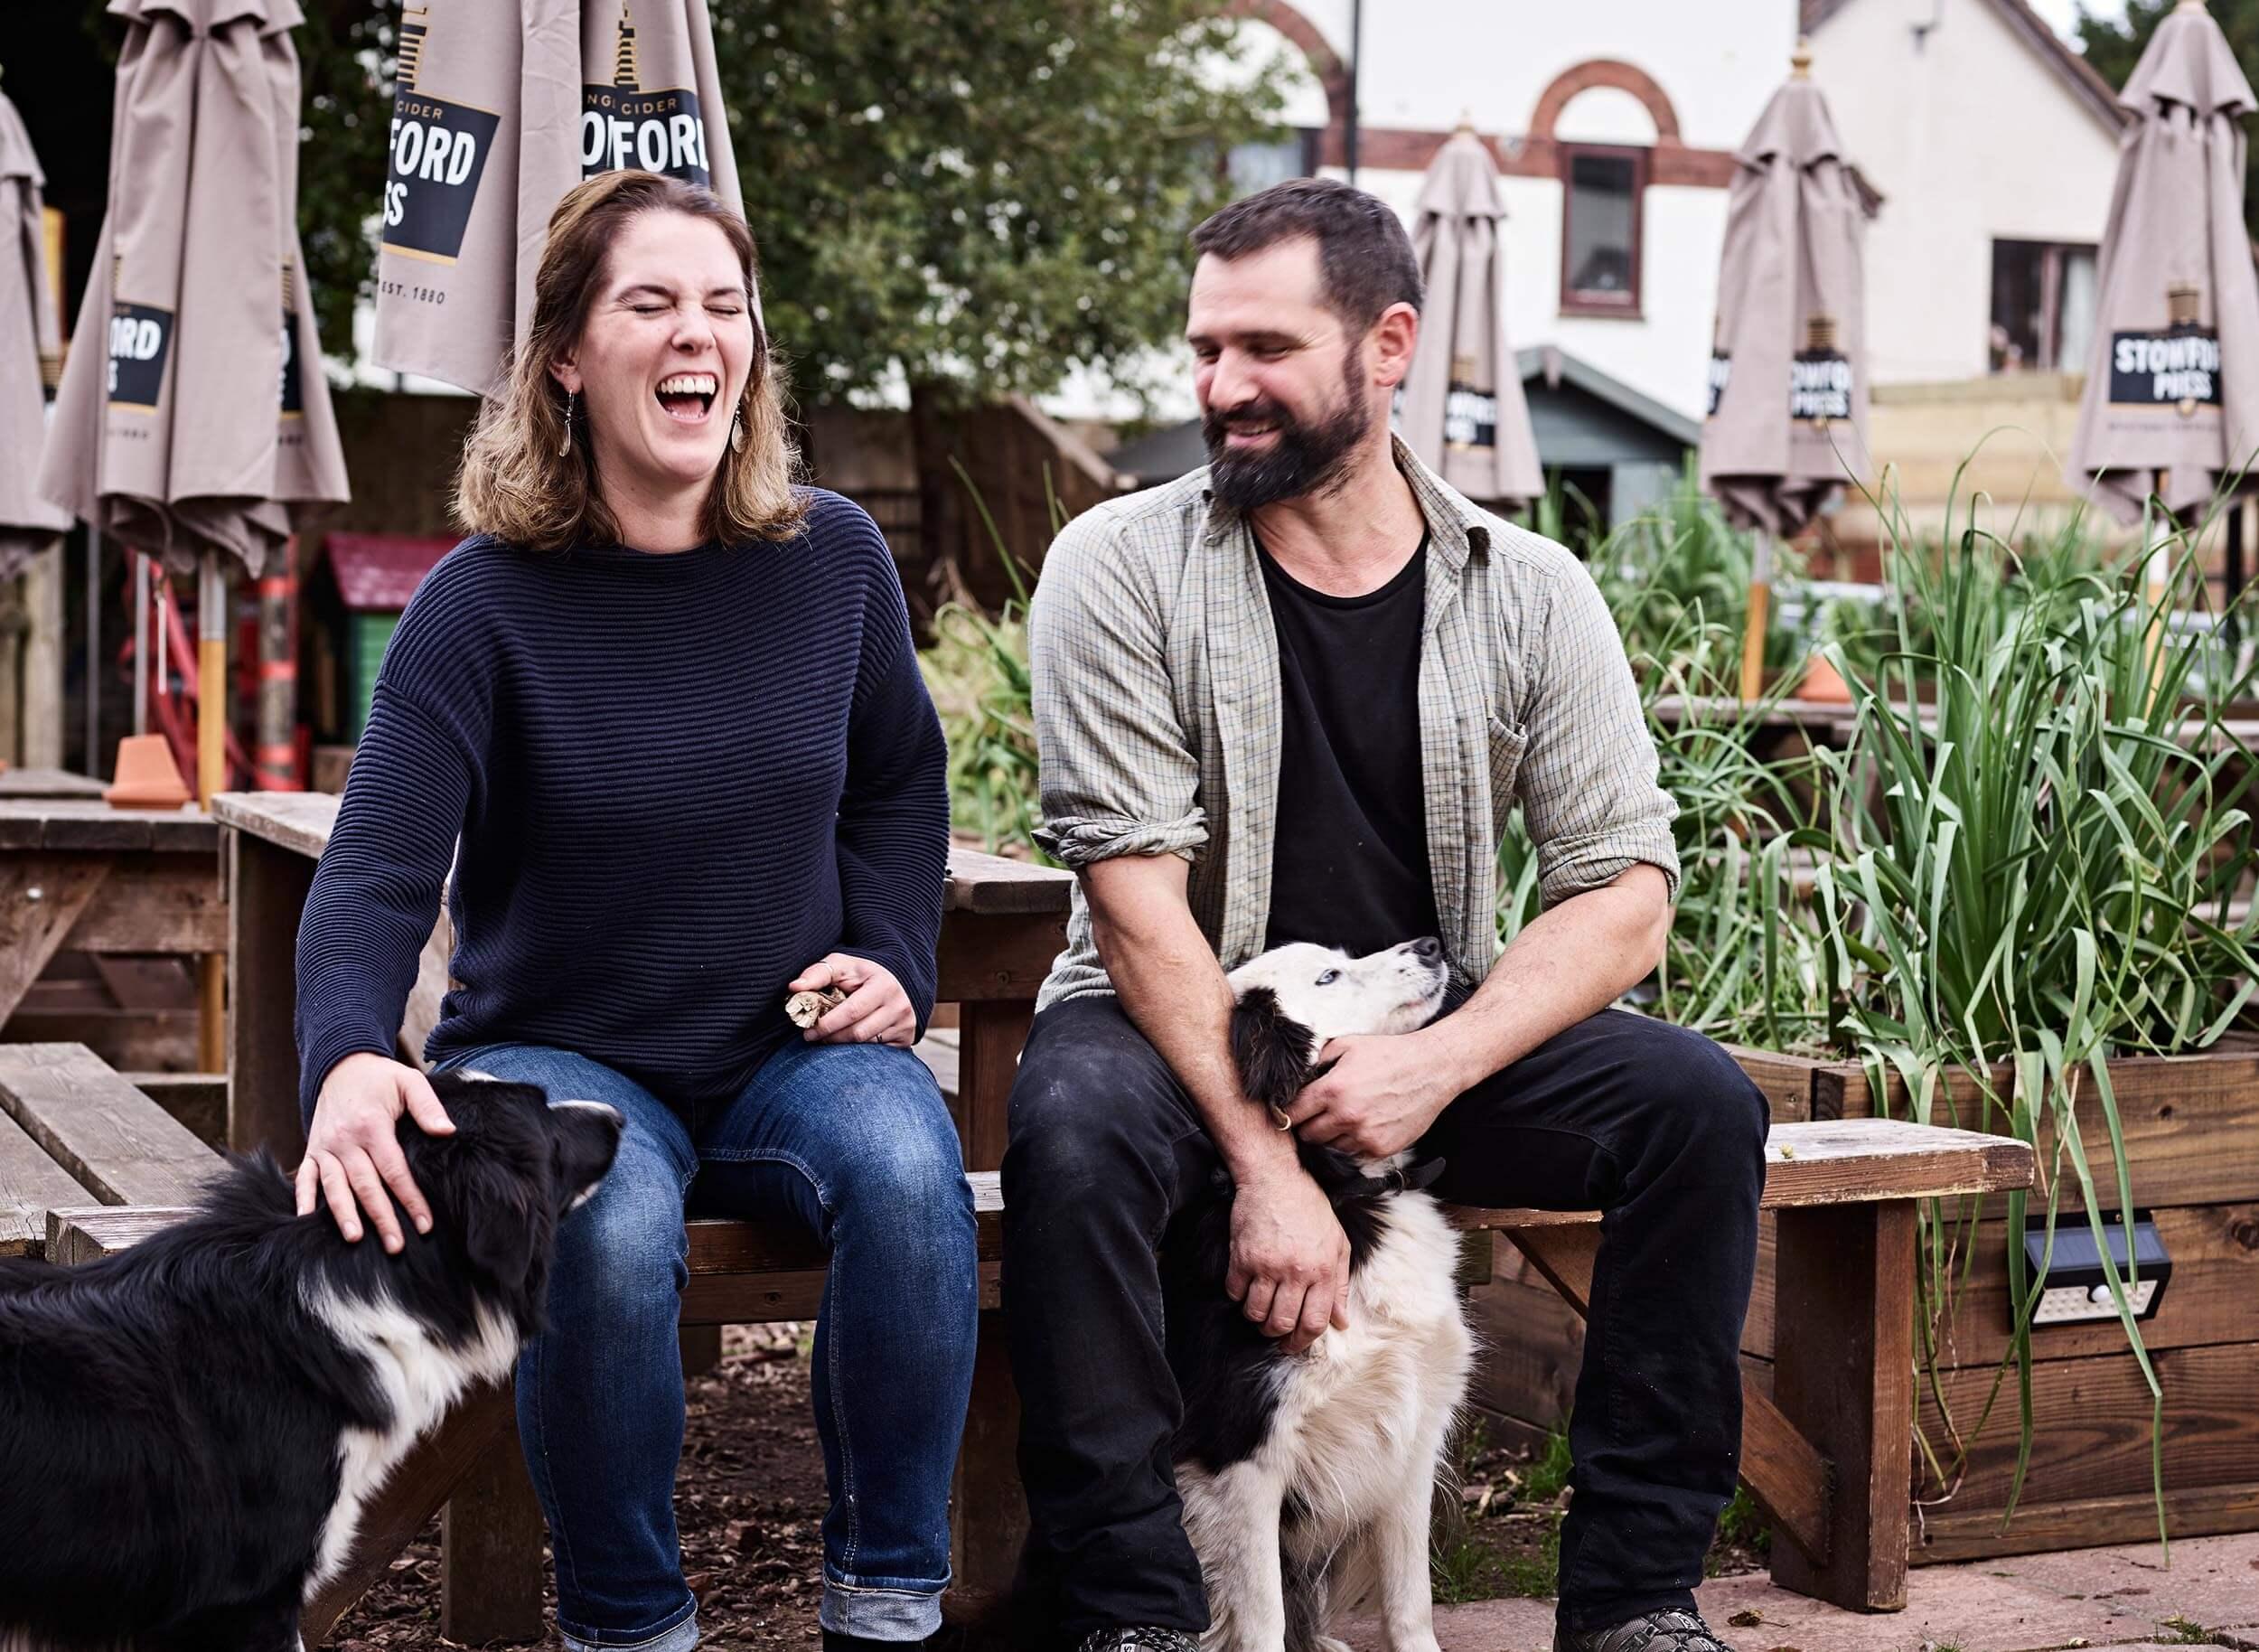 Your hosts, Millie Spurr and Jon Coward